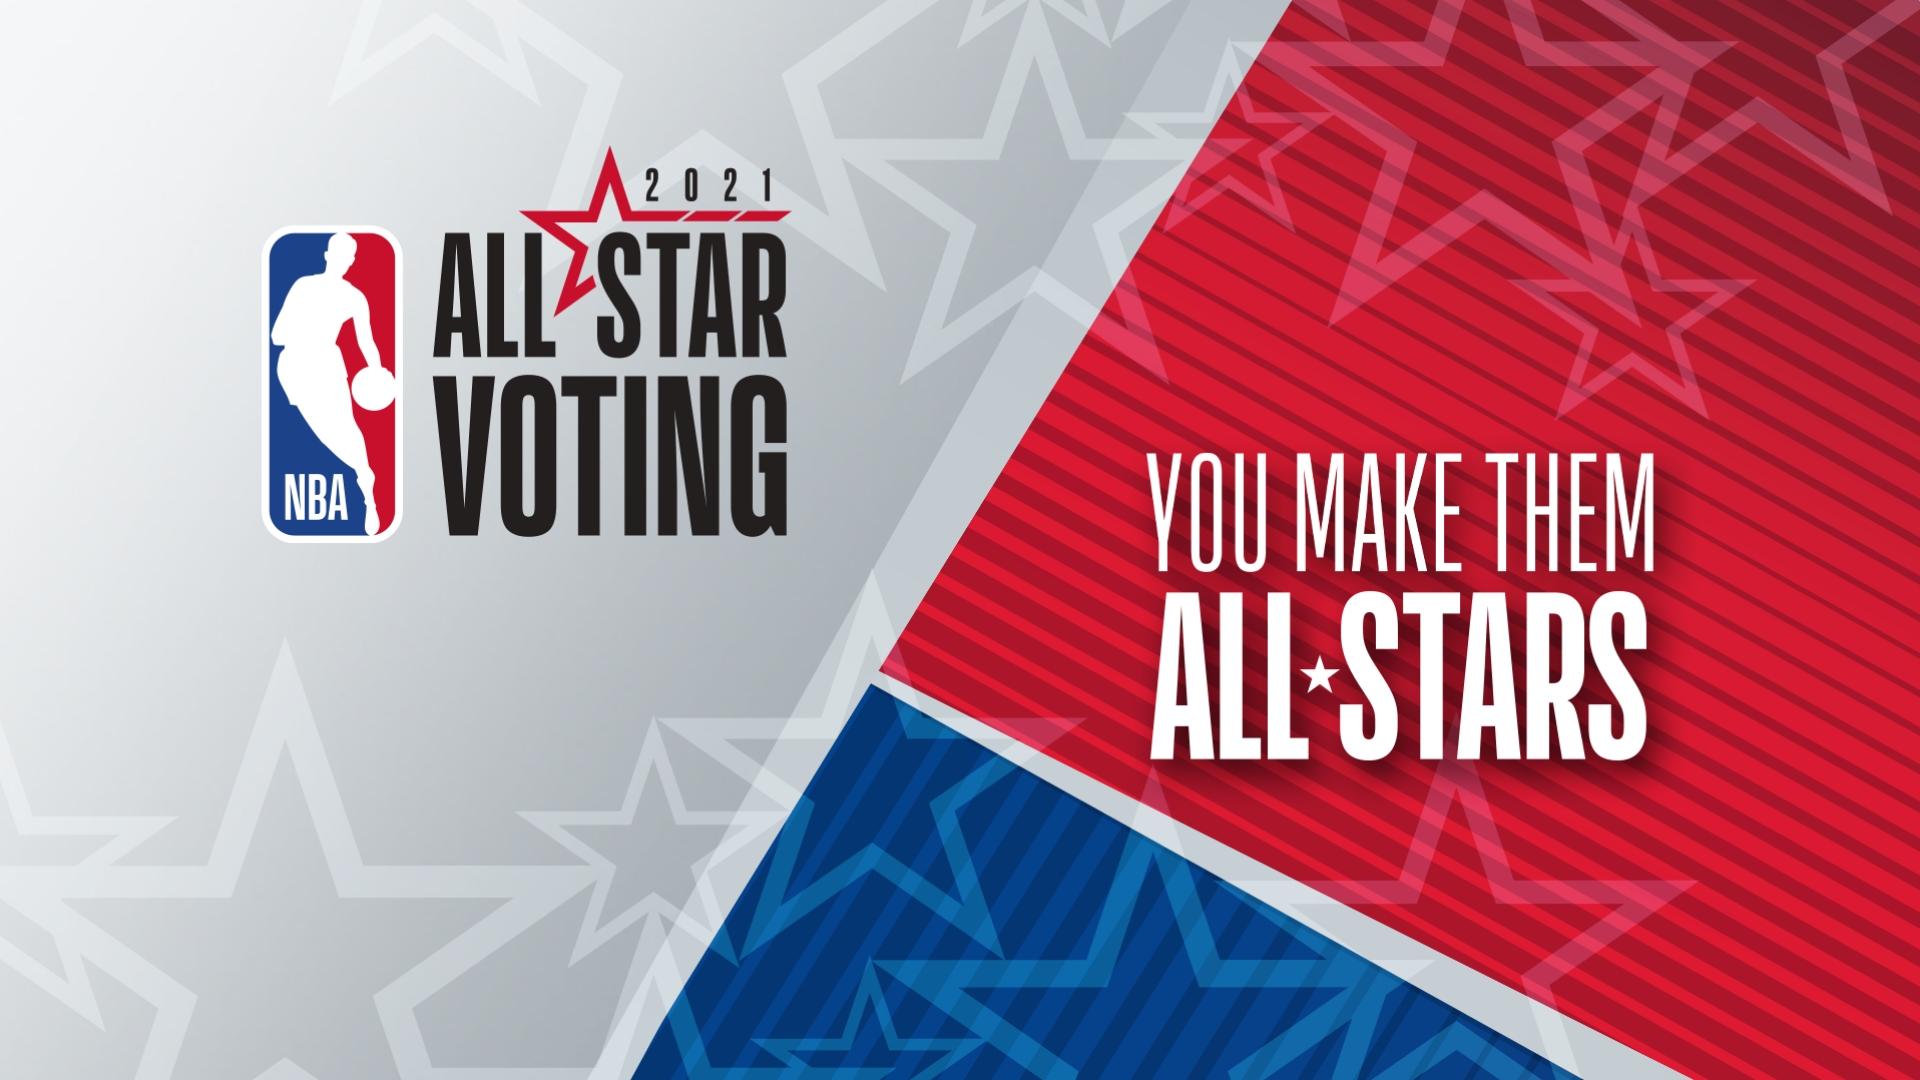 Nba All Star Voting 2021